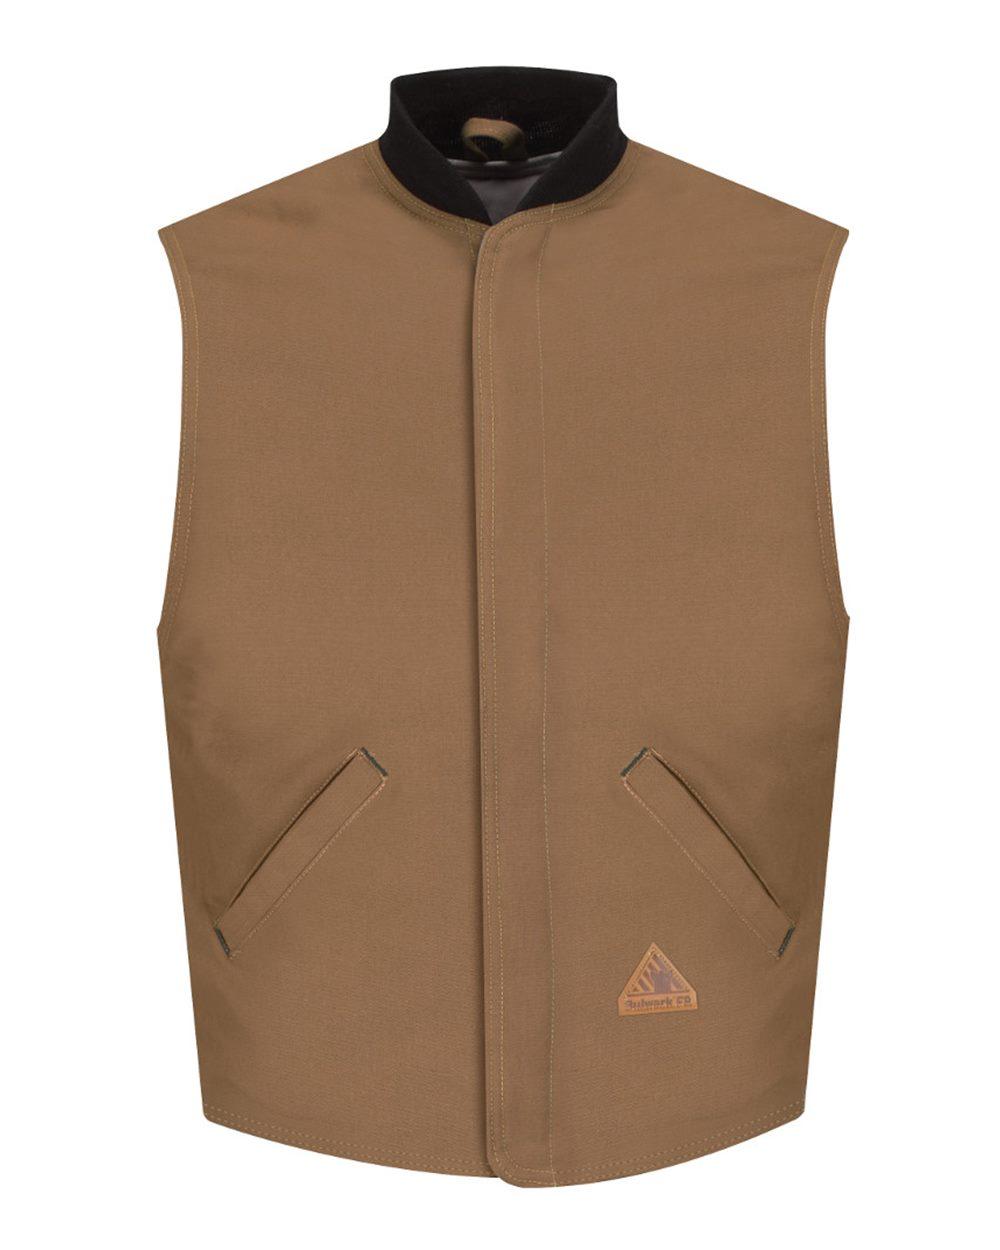 Brown Duck Vest Jacket Liner - EXCEL FR® ComforTouch® - Long Sizes